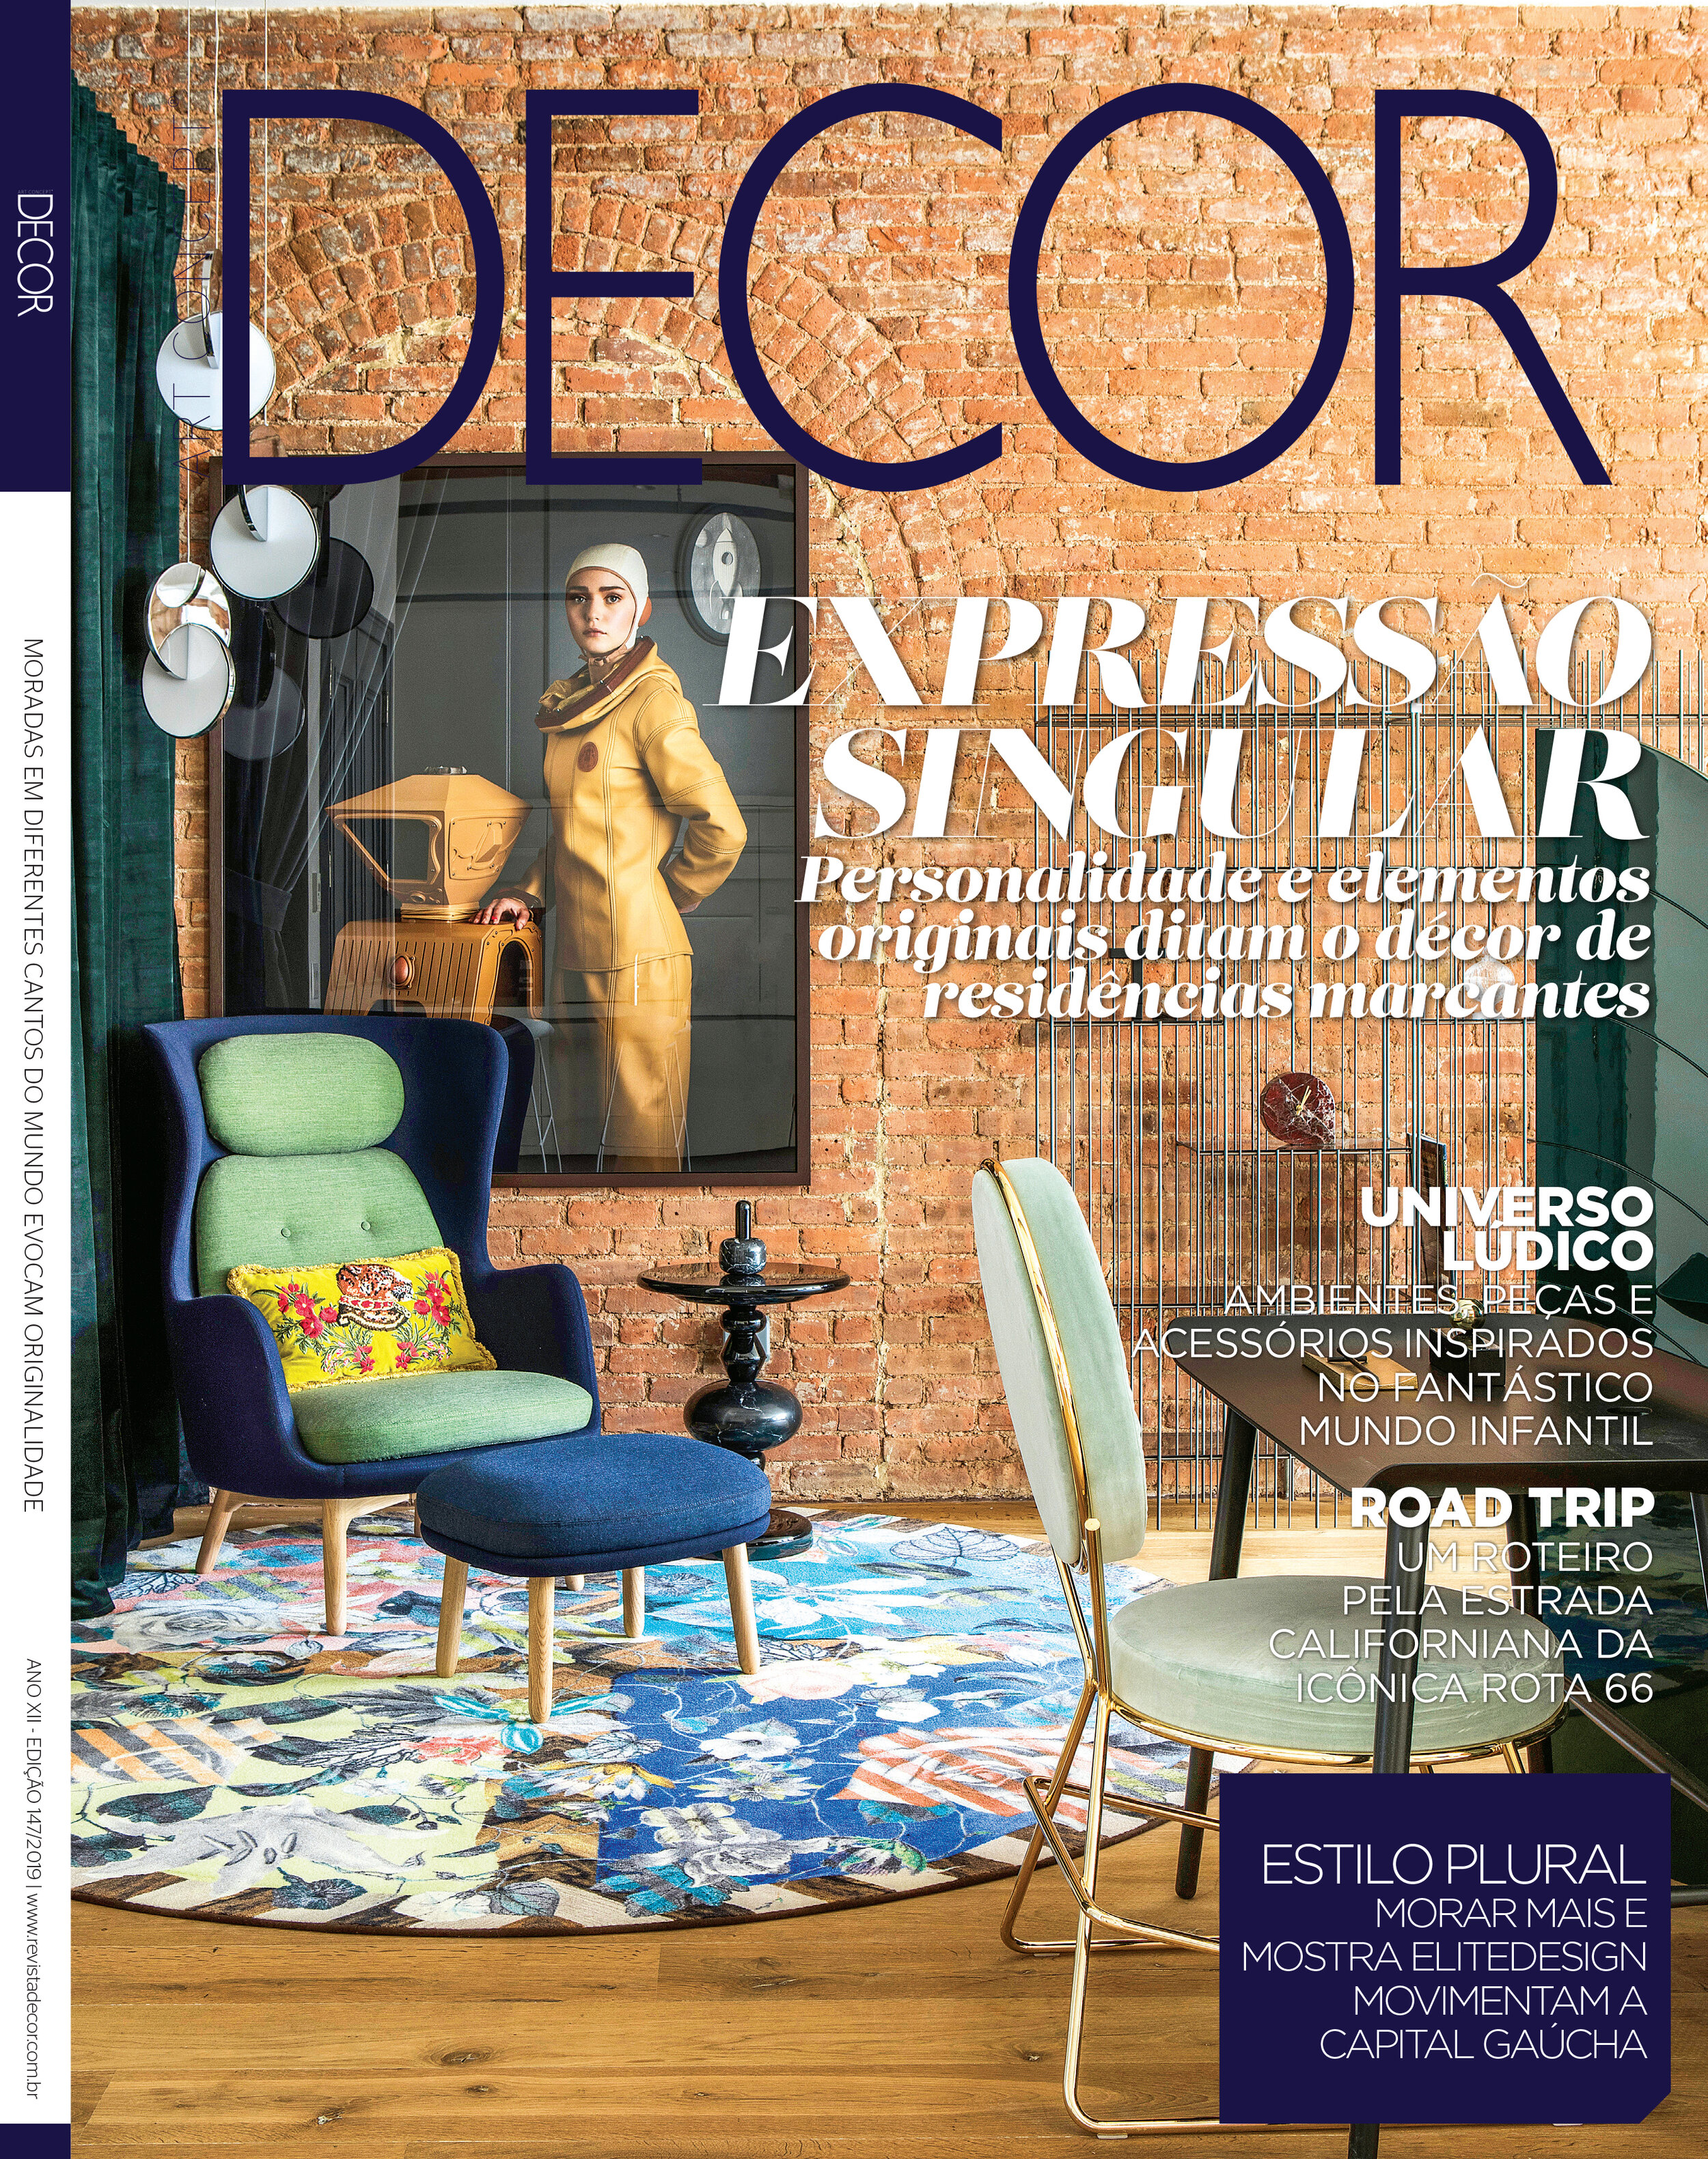 Capa 147 - Revista Decor.jpg